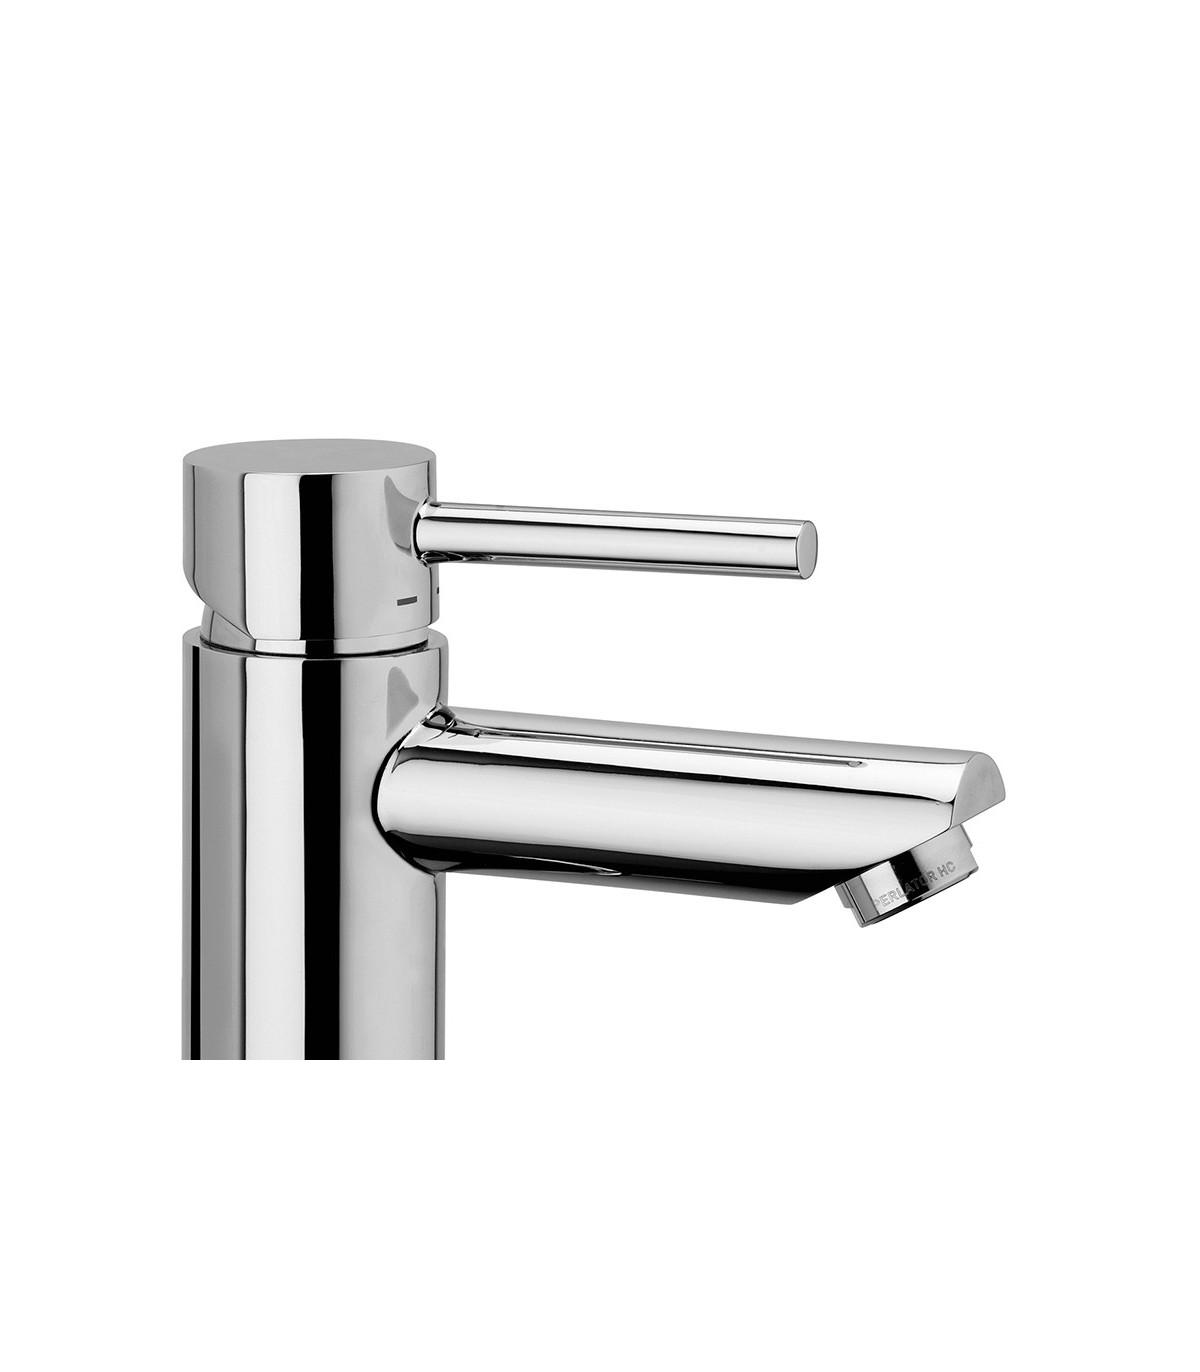 Miscelatore lavabo Paffoni Stick 075 compra online